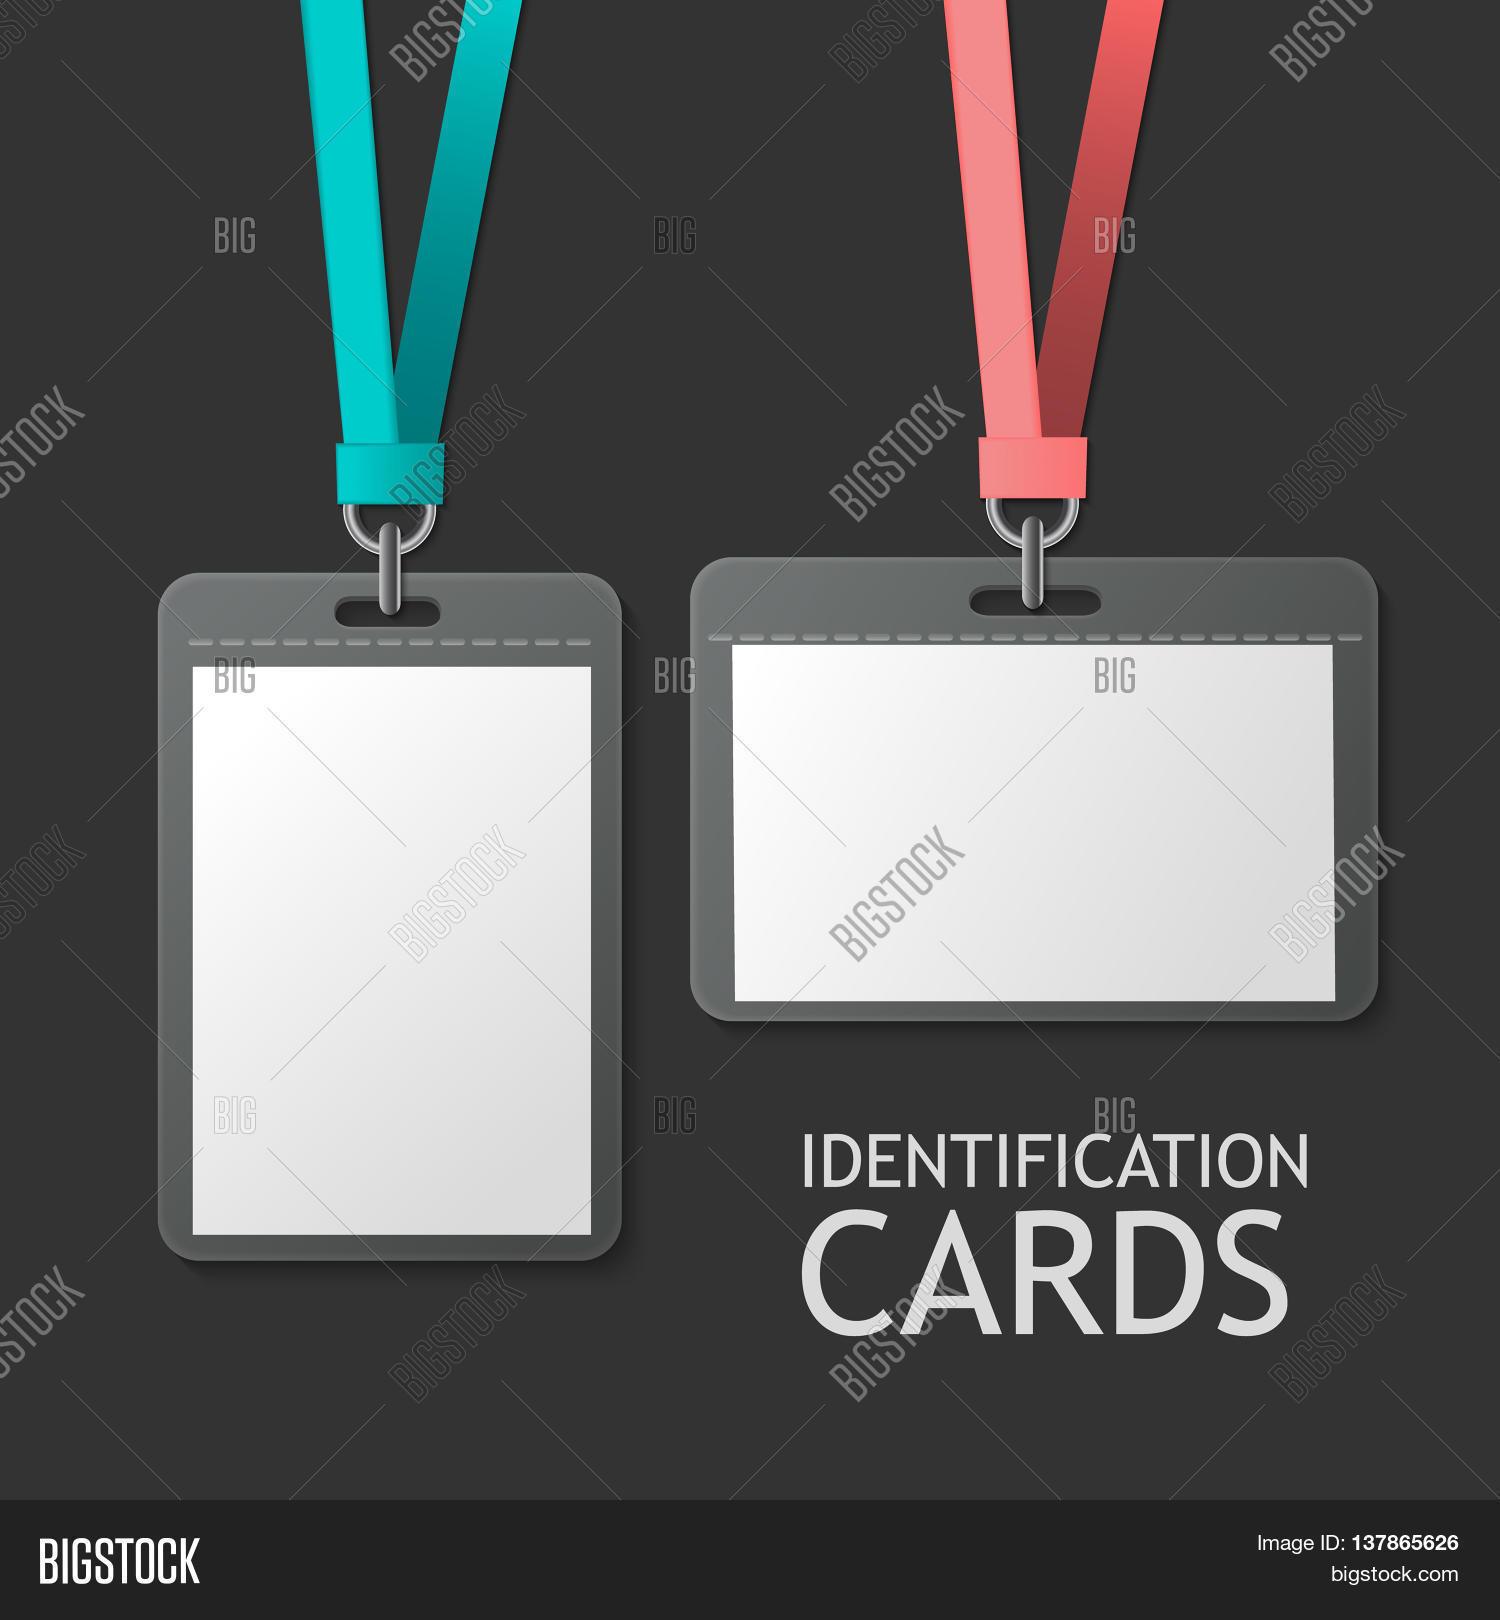 Badge Identification Image & Photo (Free Trial)   Bigstock